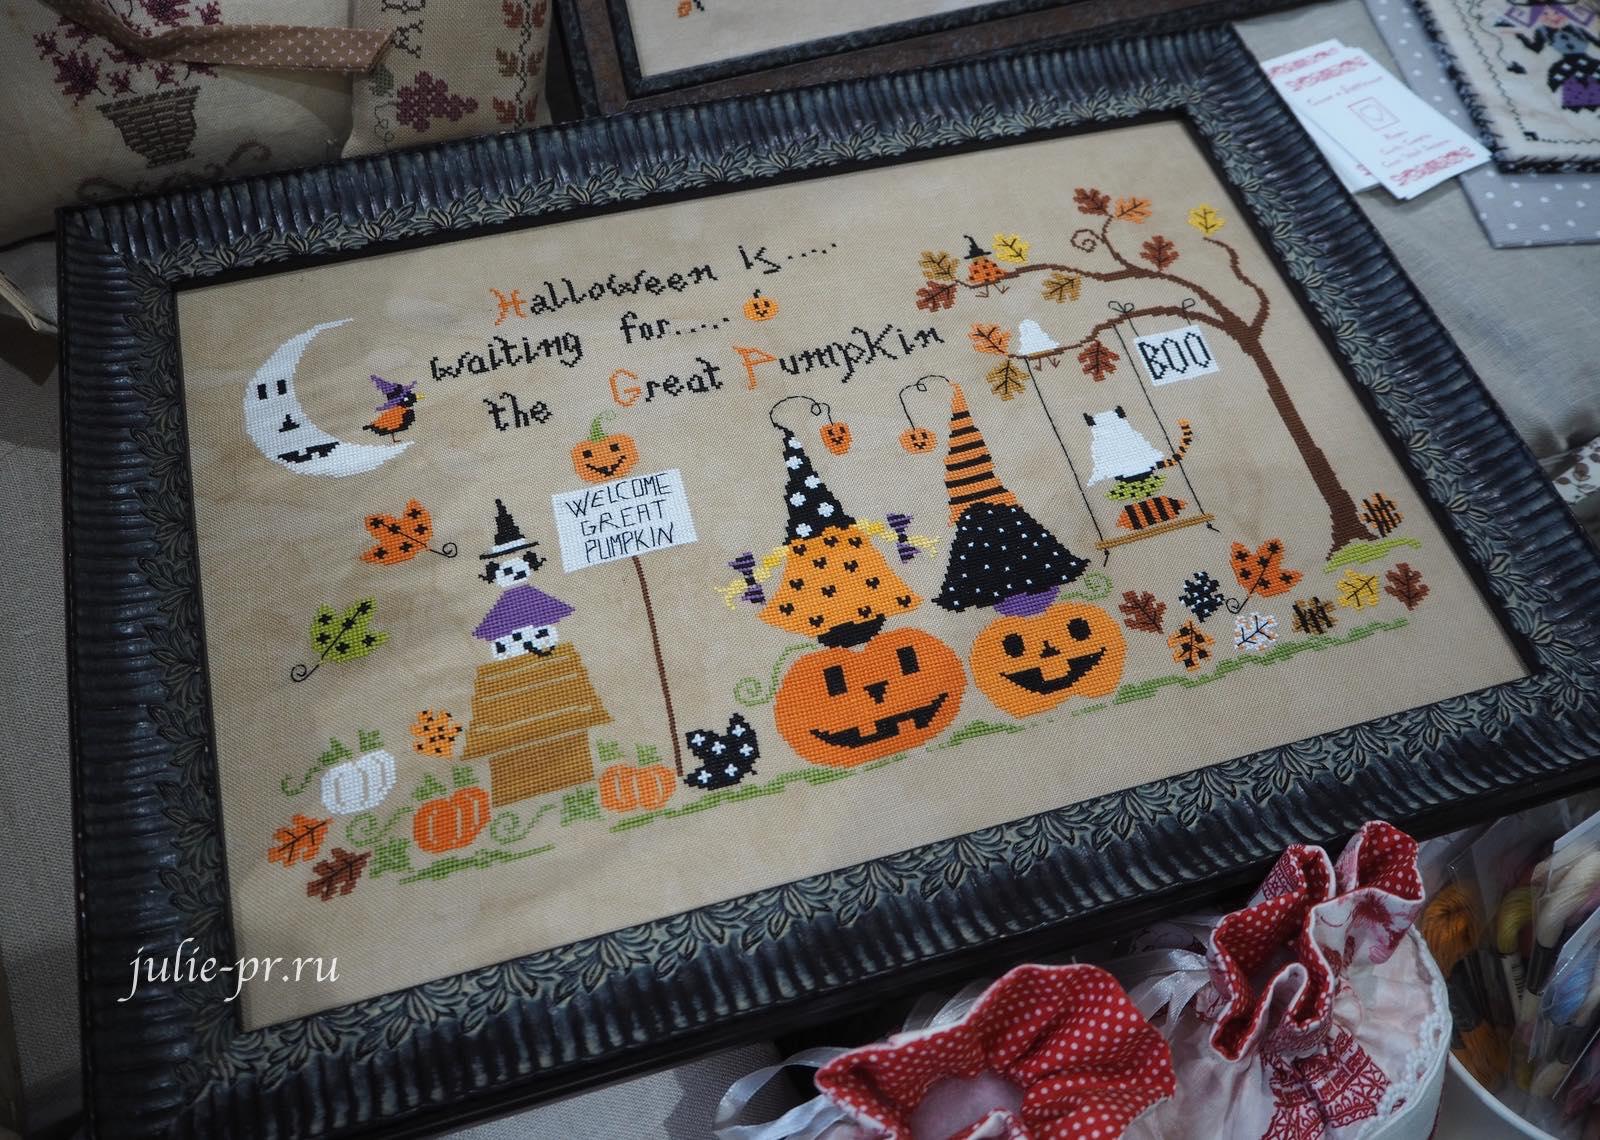 Cuore e Batticuore, Welcome Great Pumpkin, вышивка крестом, хеллоуин